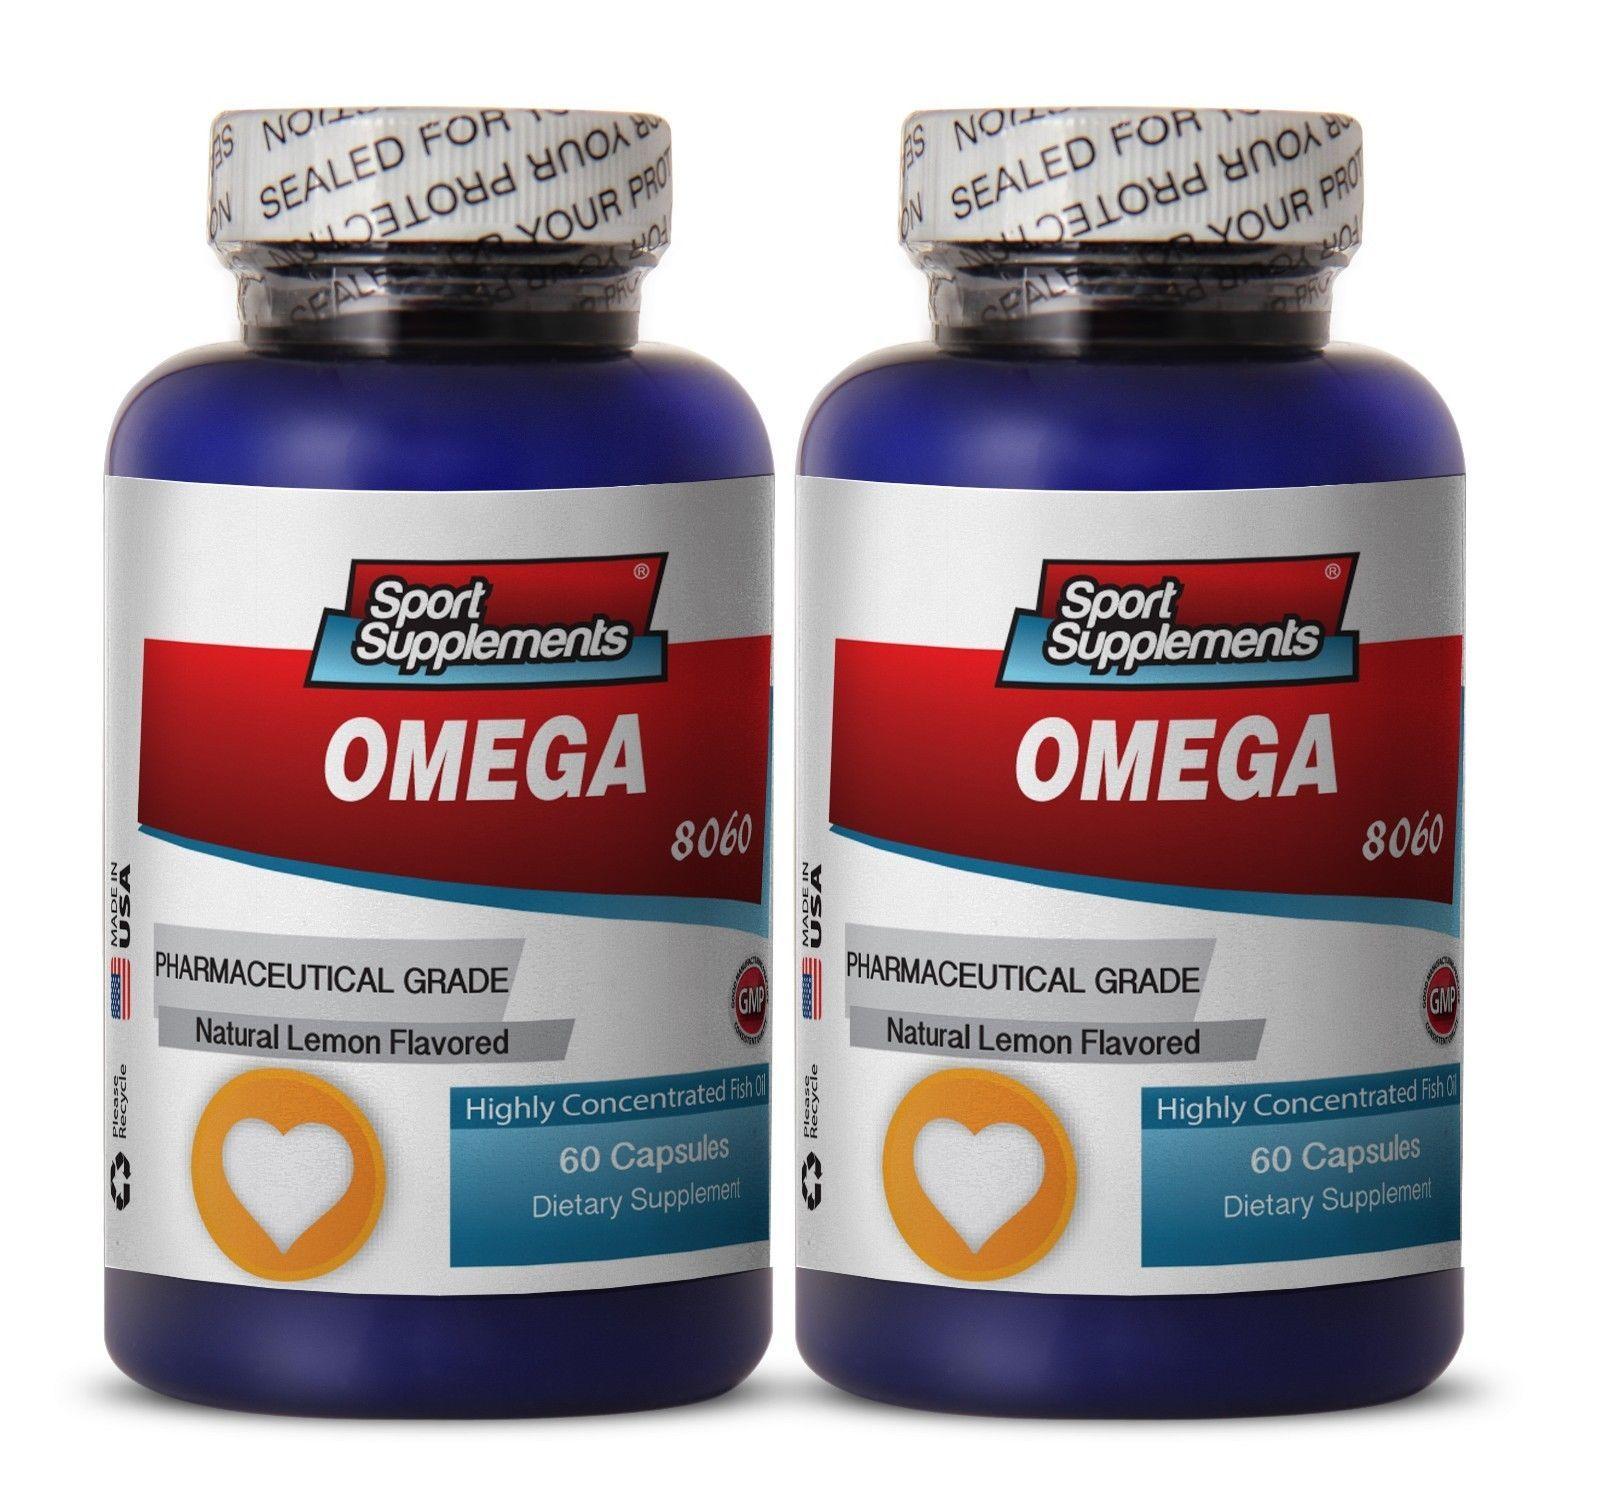 Cardio heart health fish oil omega 3 6 9 3000mg for Fish oil 3 6 9